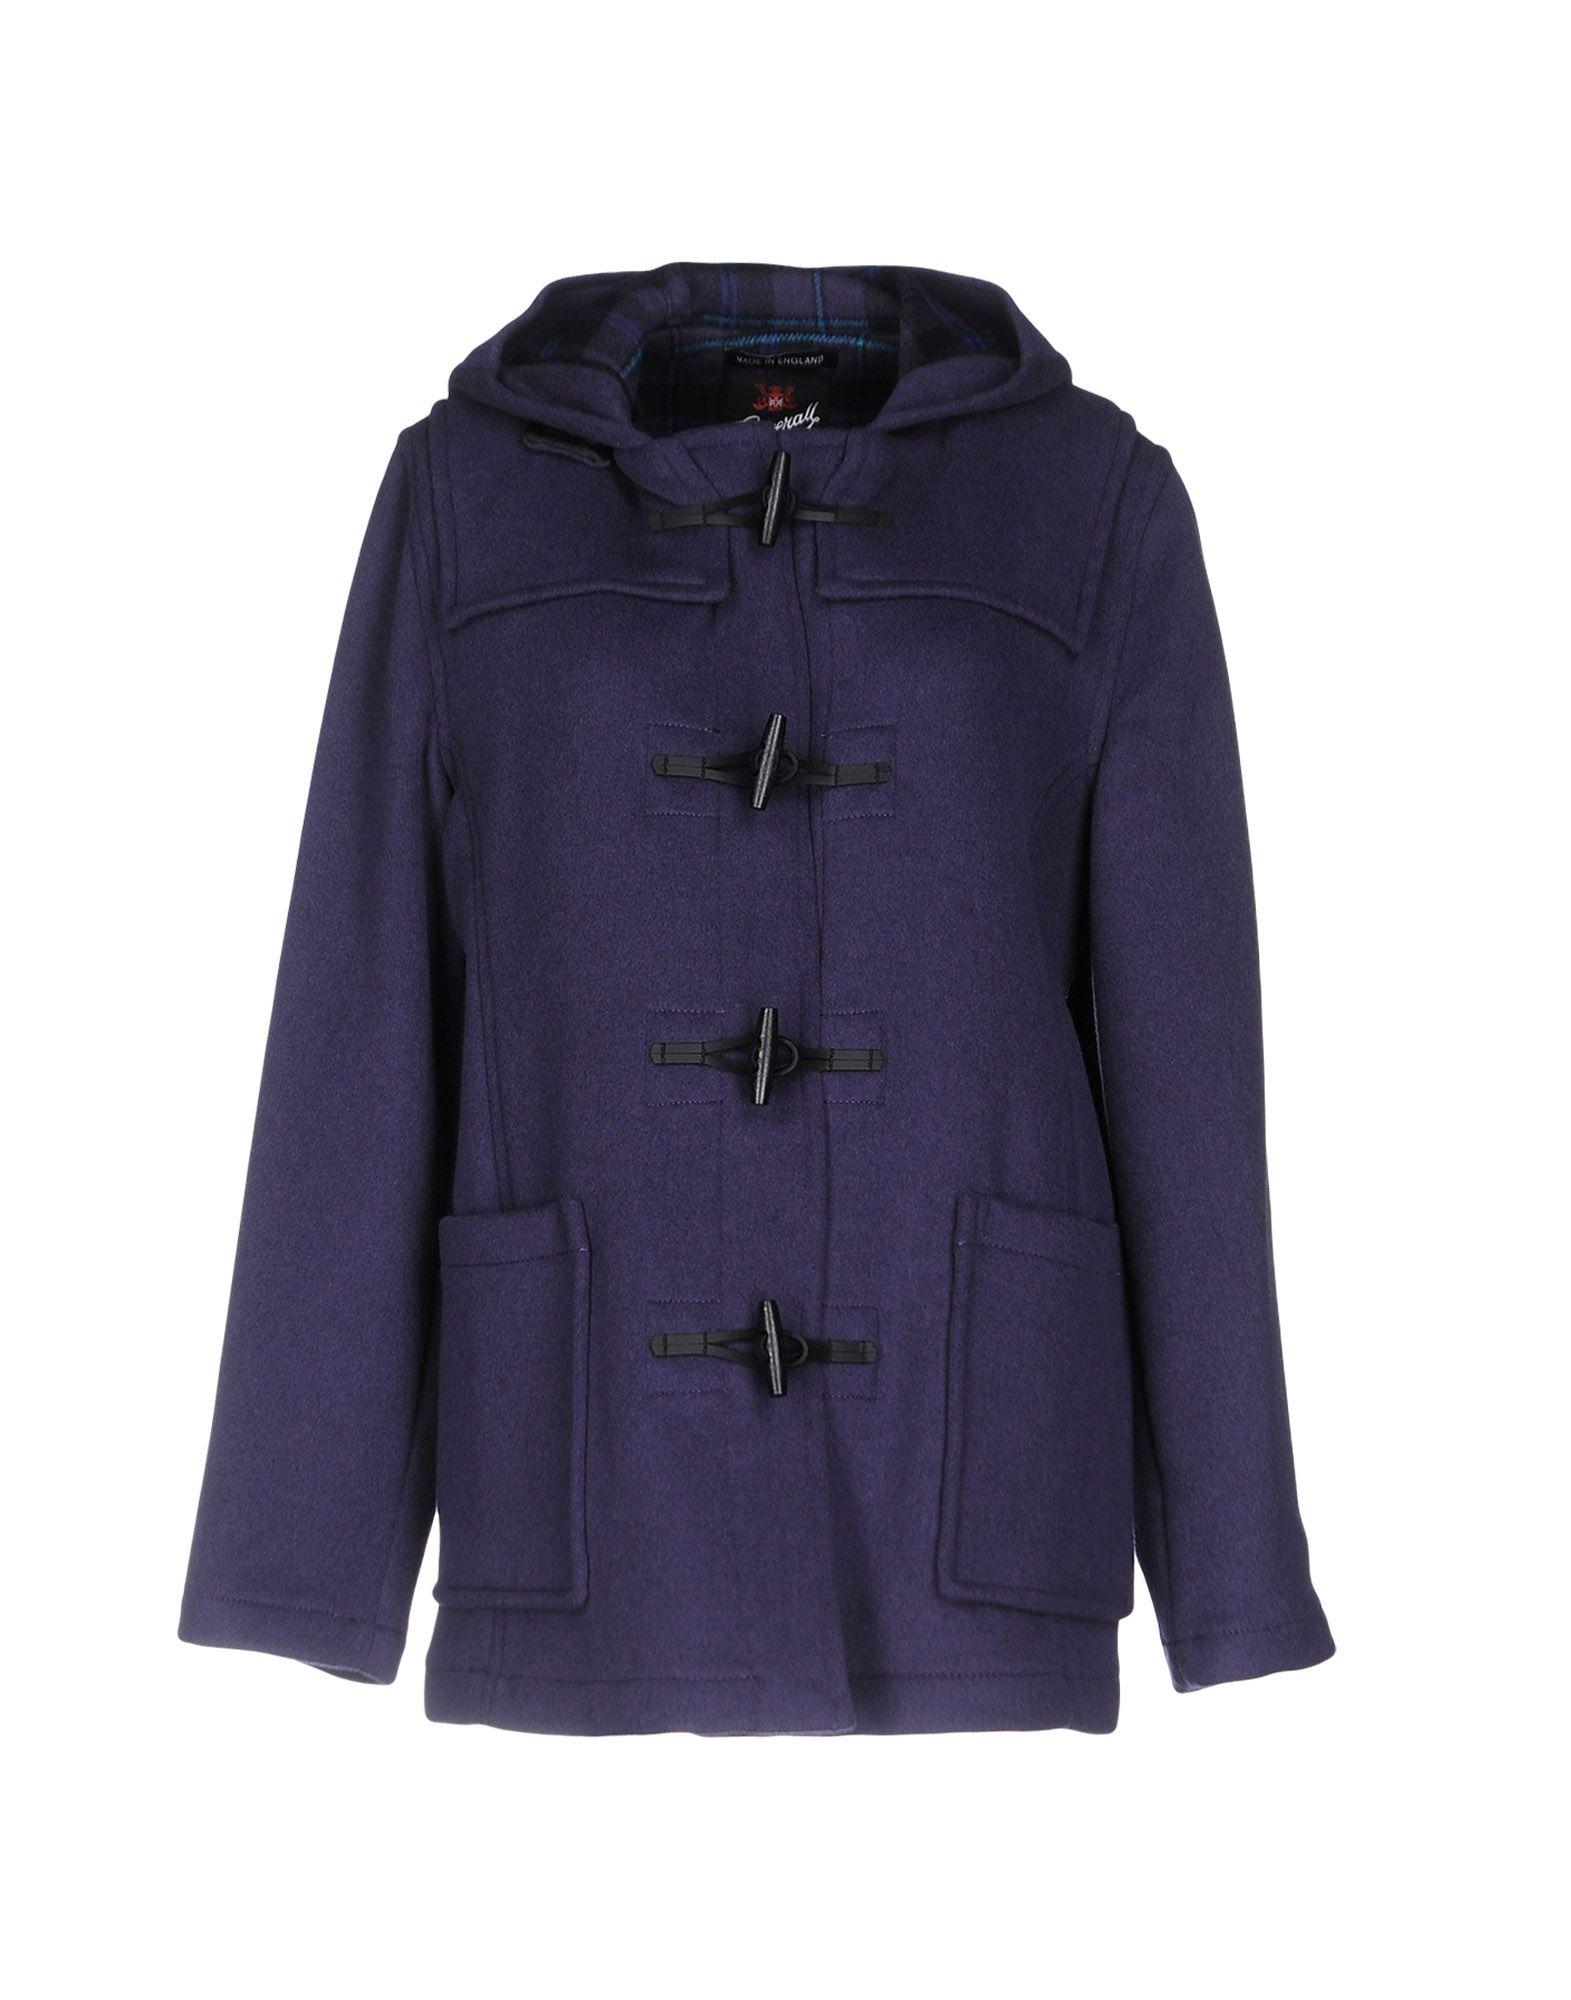 GLOVERALL Coat in Purple